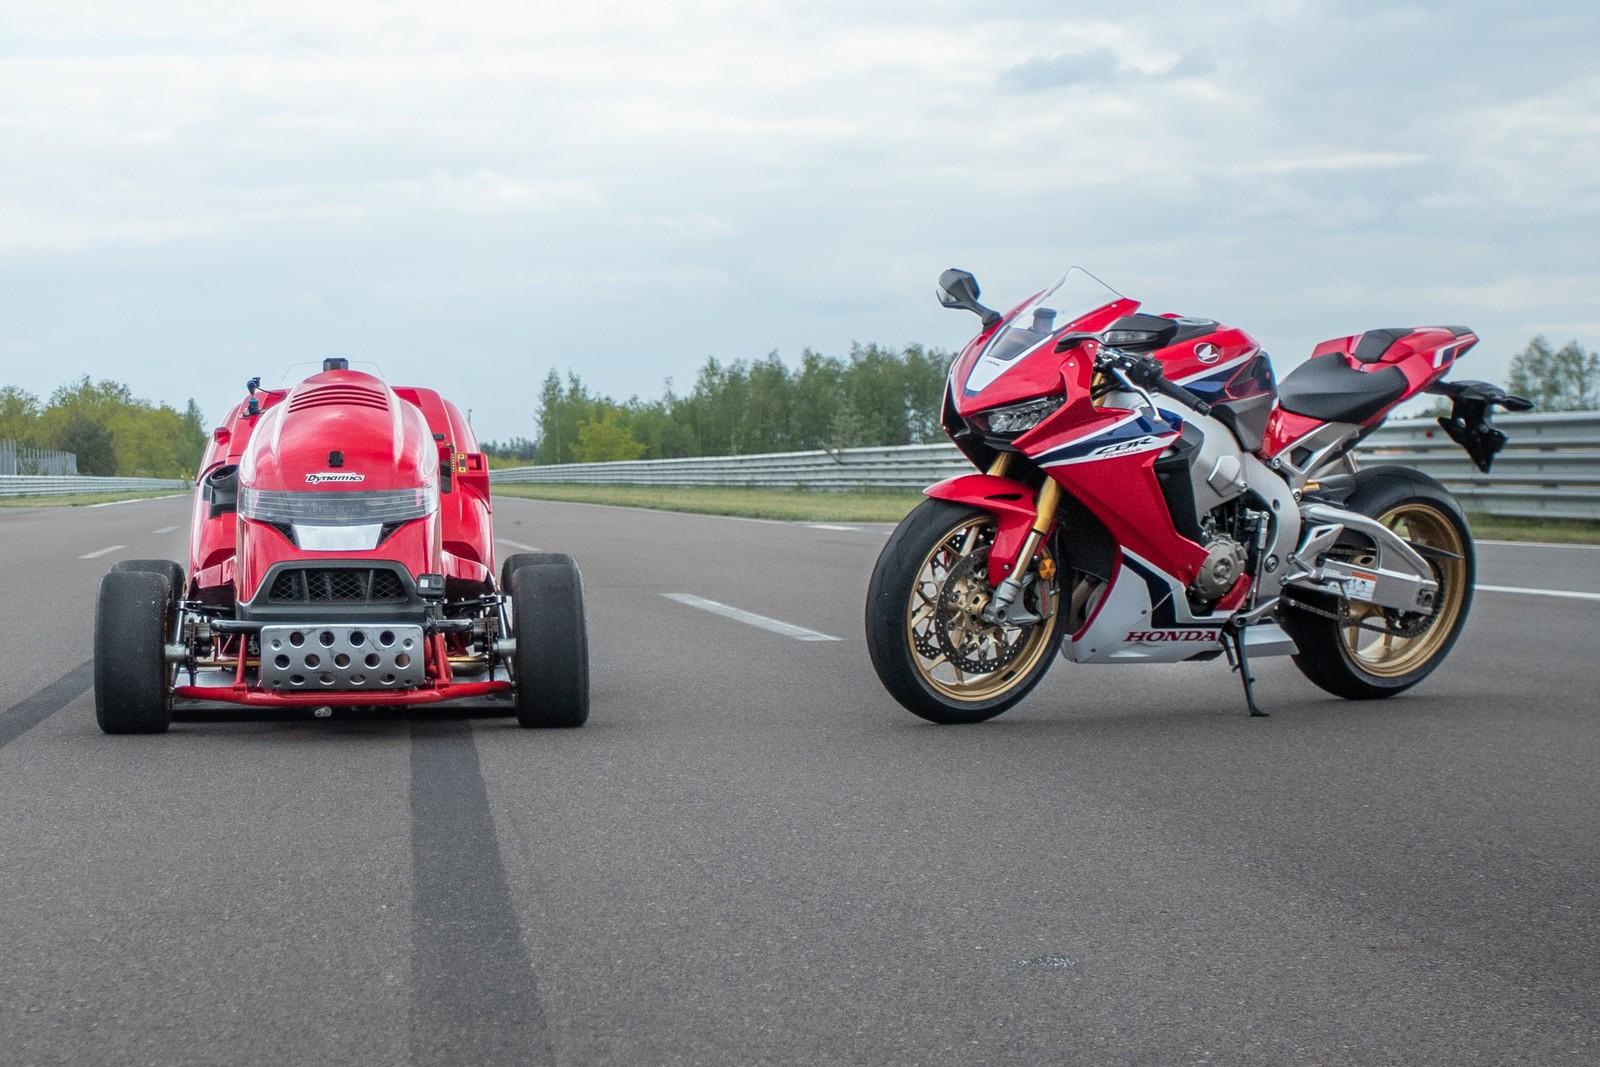 Mean Mower V2 и донор двигателя – спортбайк Honda CBR1000RR Fireblade SP